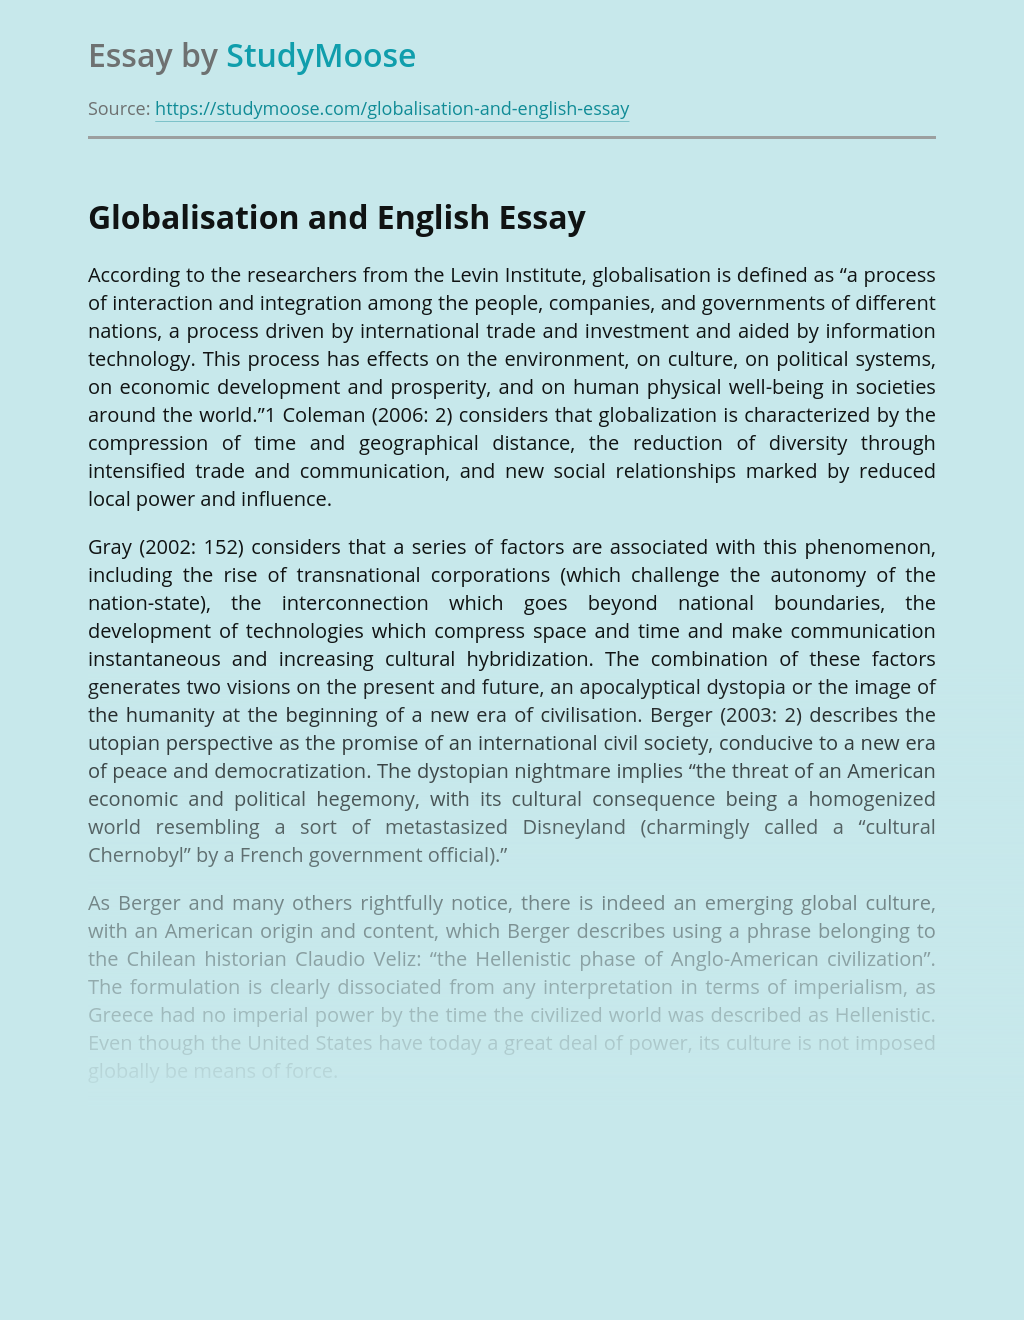 Globalisation and English